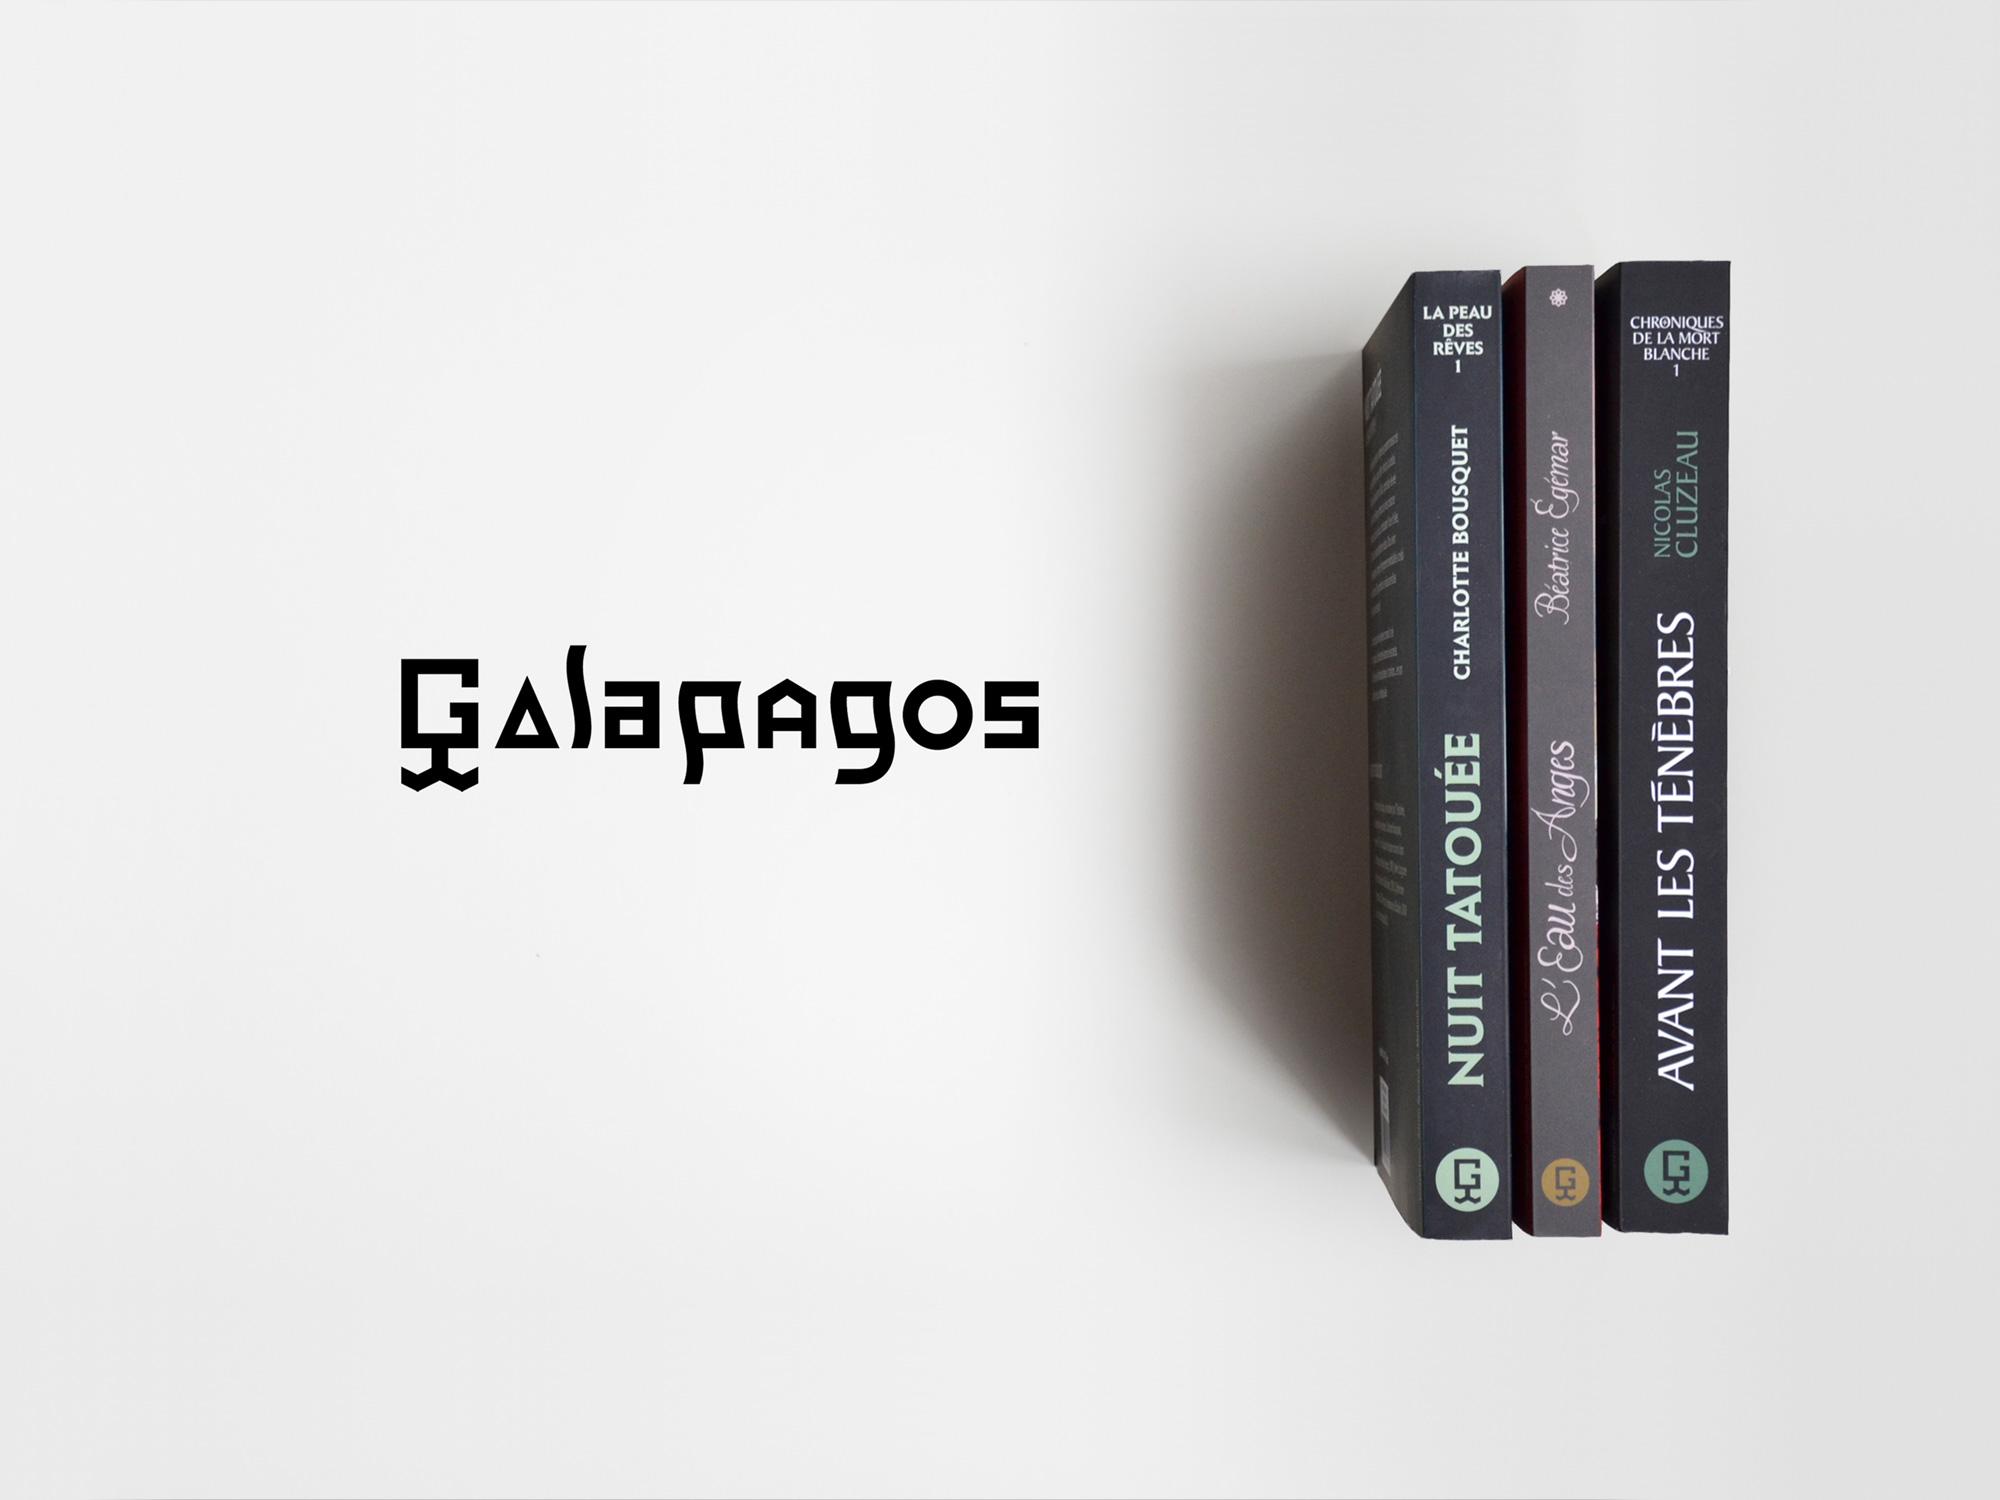 http://a-aa.fr/projet/galapagos/